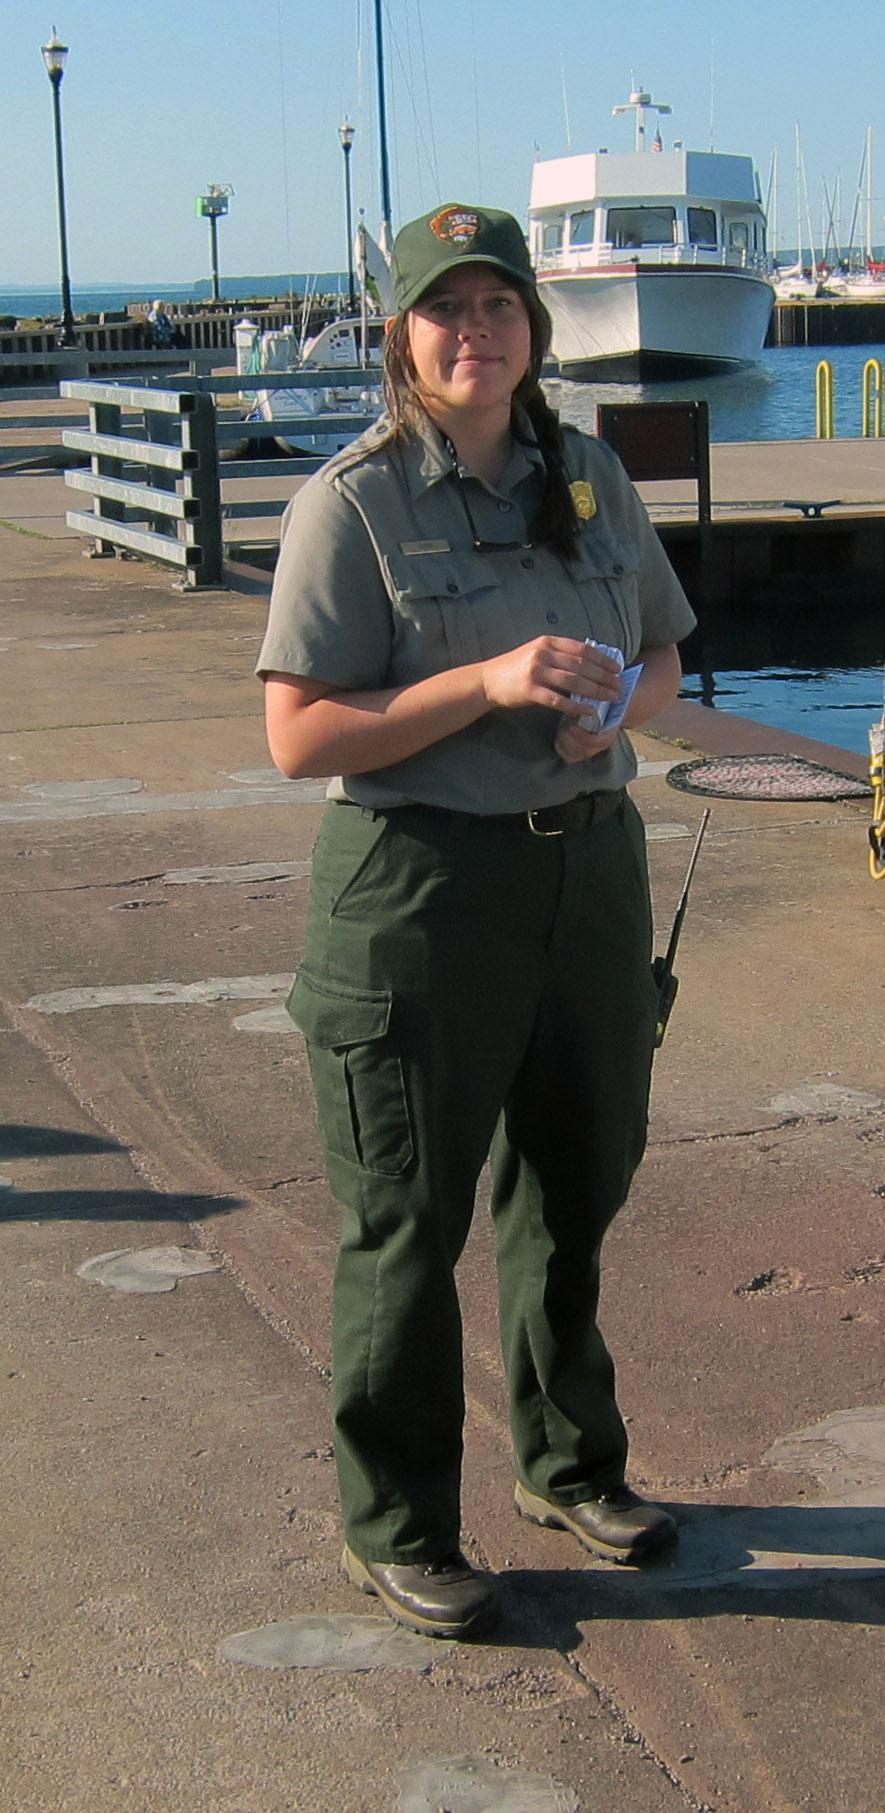 Ranger Sophie Howk at age 23